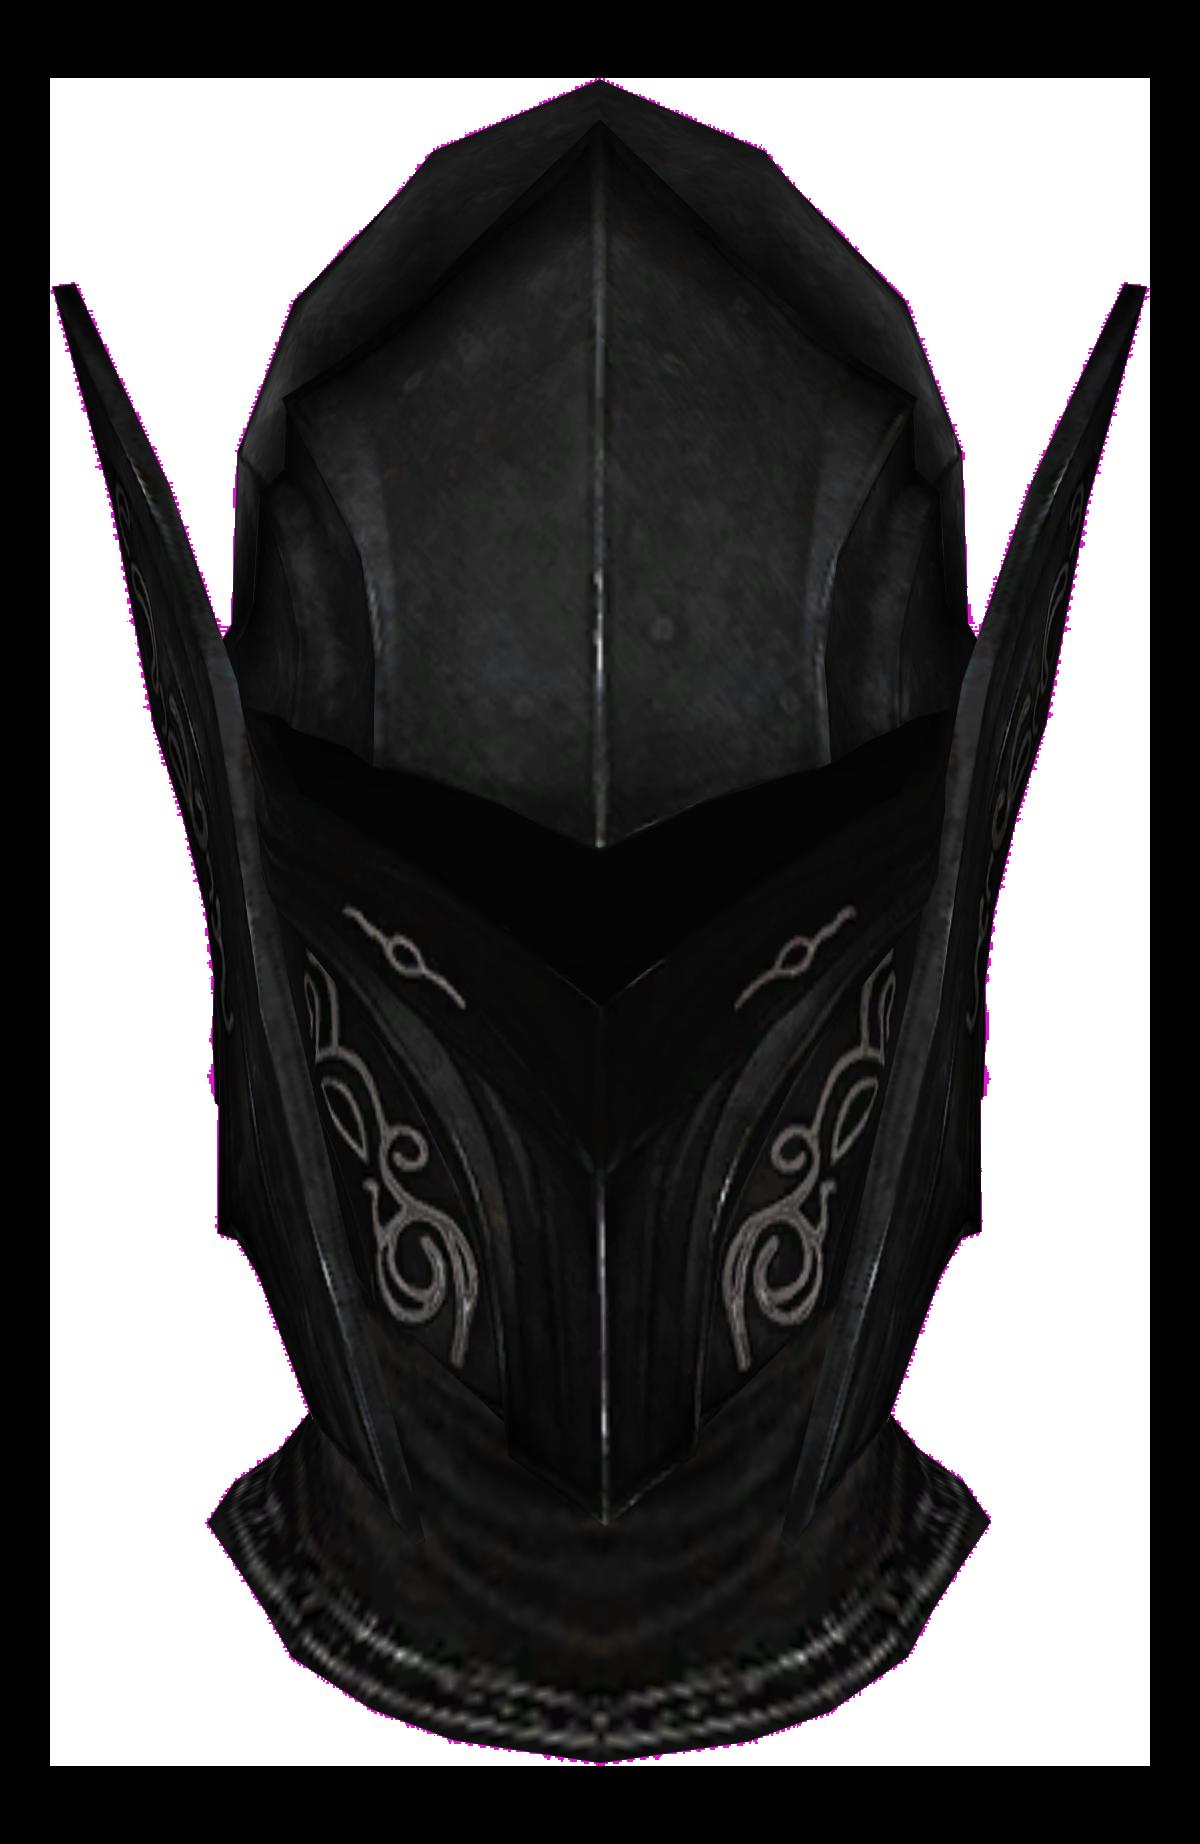 Ebony Helmet Skyrim Elder Scrolls Fandom Powered By Wikia